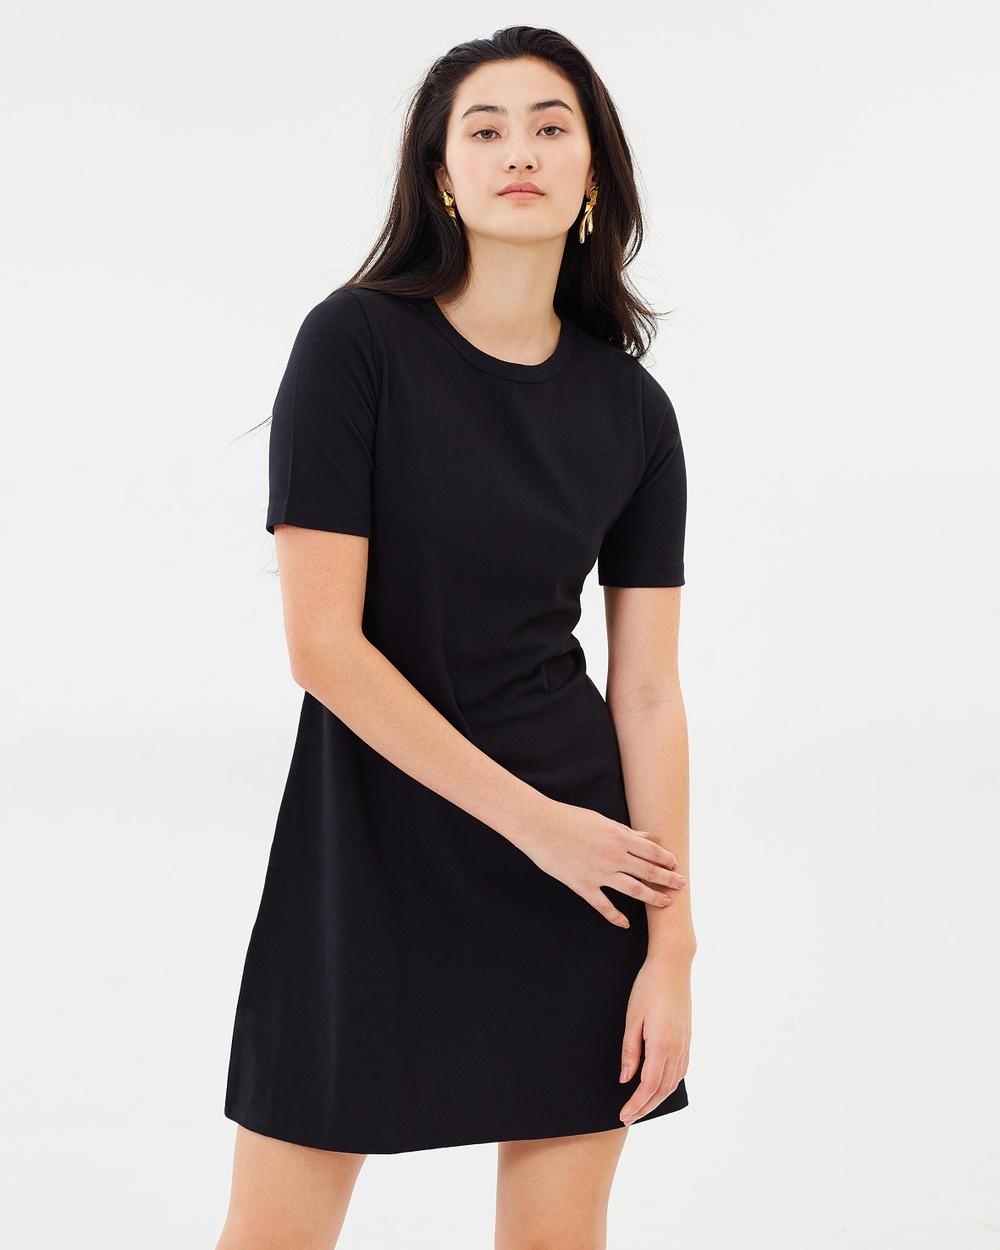 J.Crew Short Sleeve Knit Dress Dresses Black Short Sleeve Knit Dress